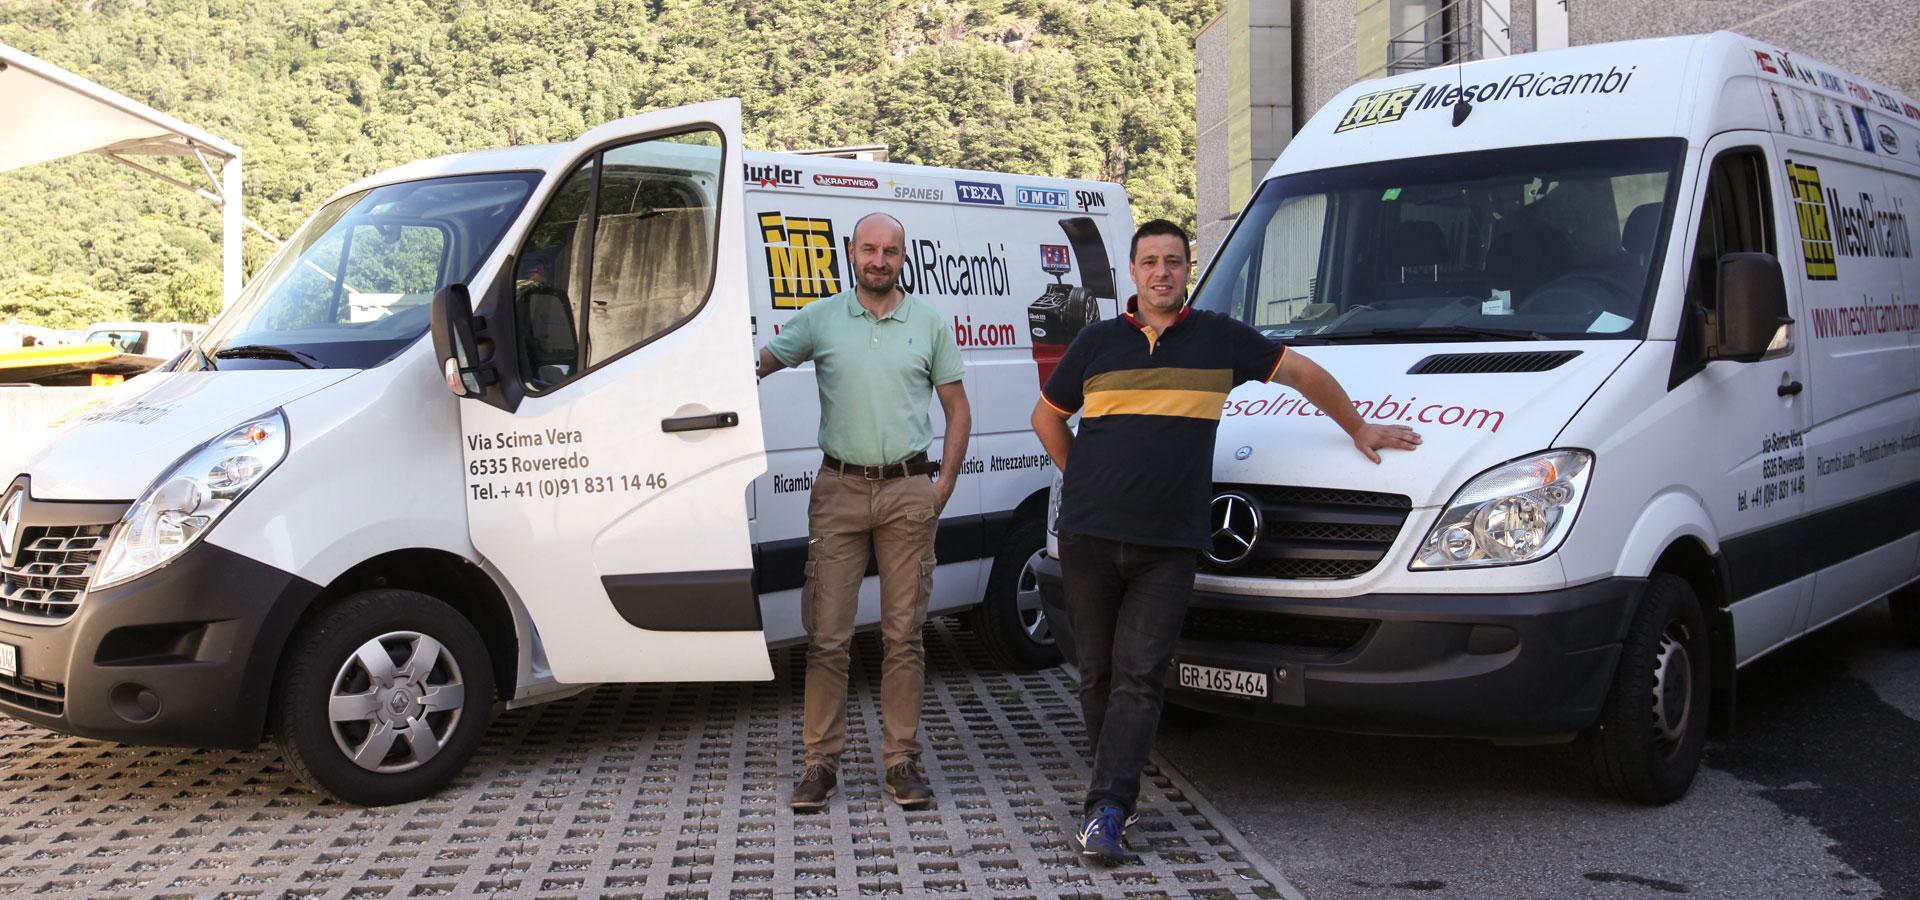 Maurizio Braga e Denis Santagiuliana, fondatori Mesolricambi Sagl